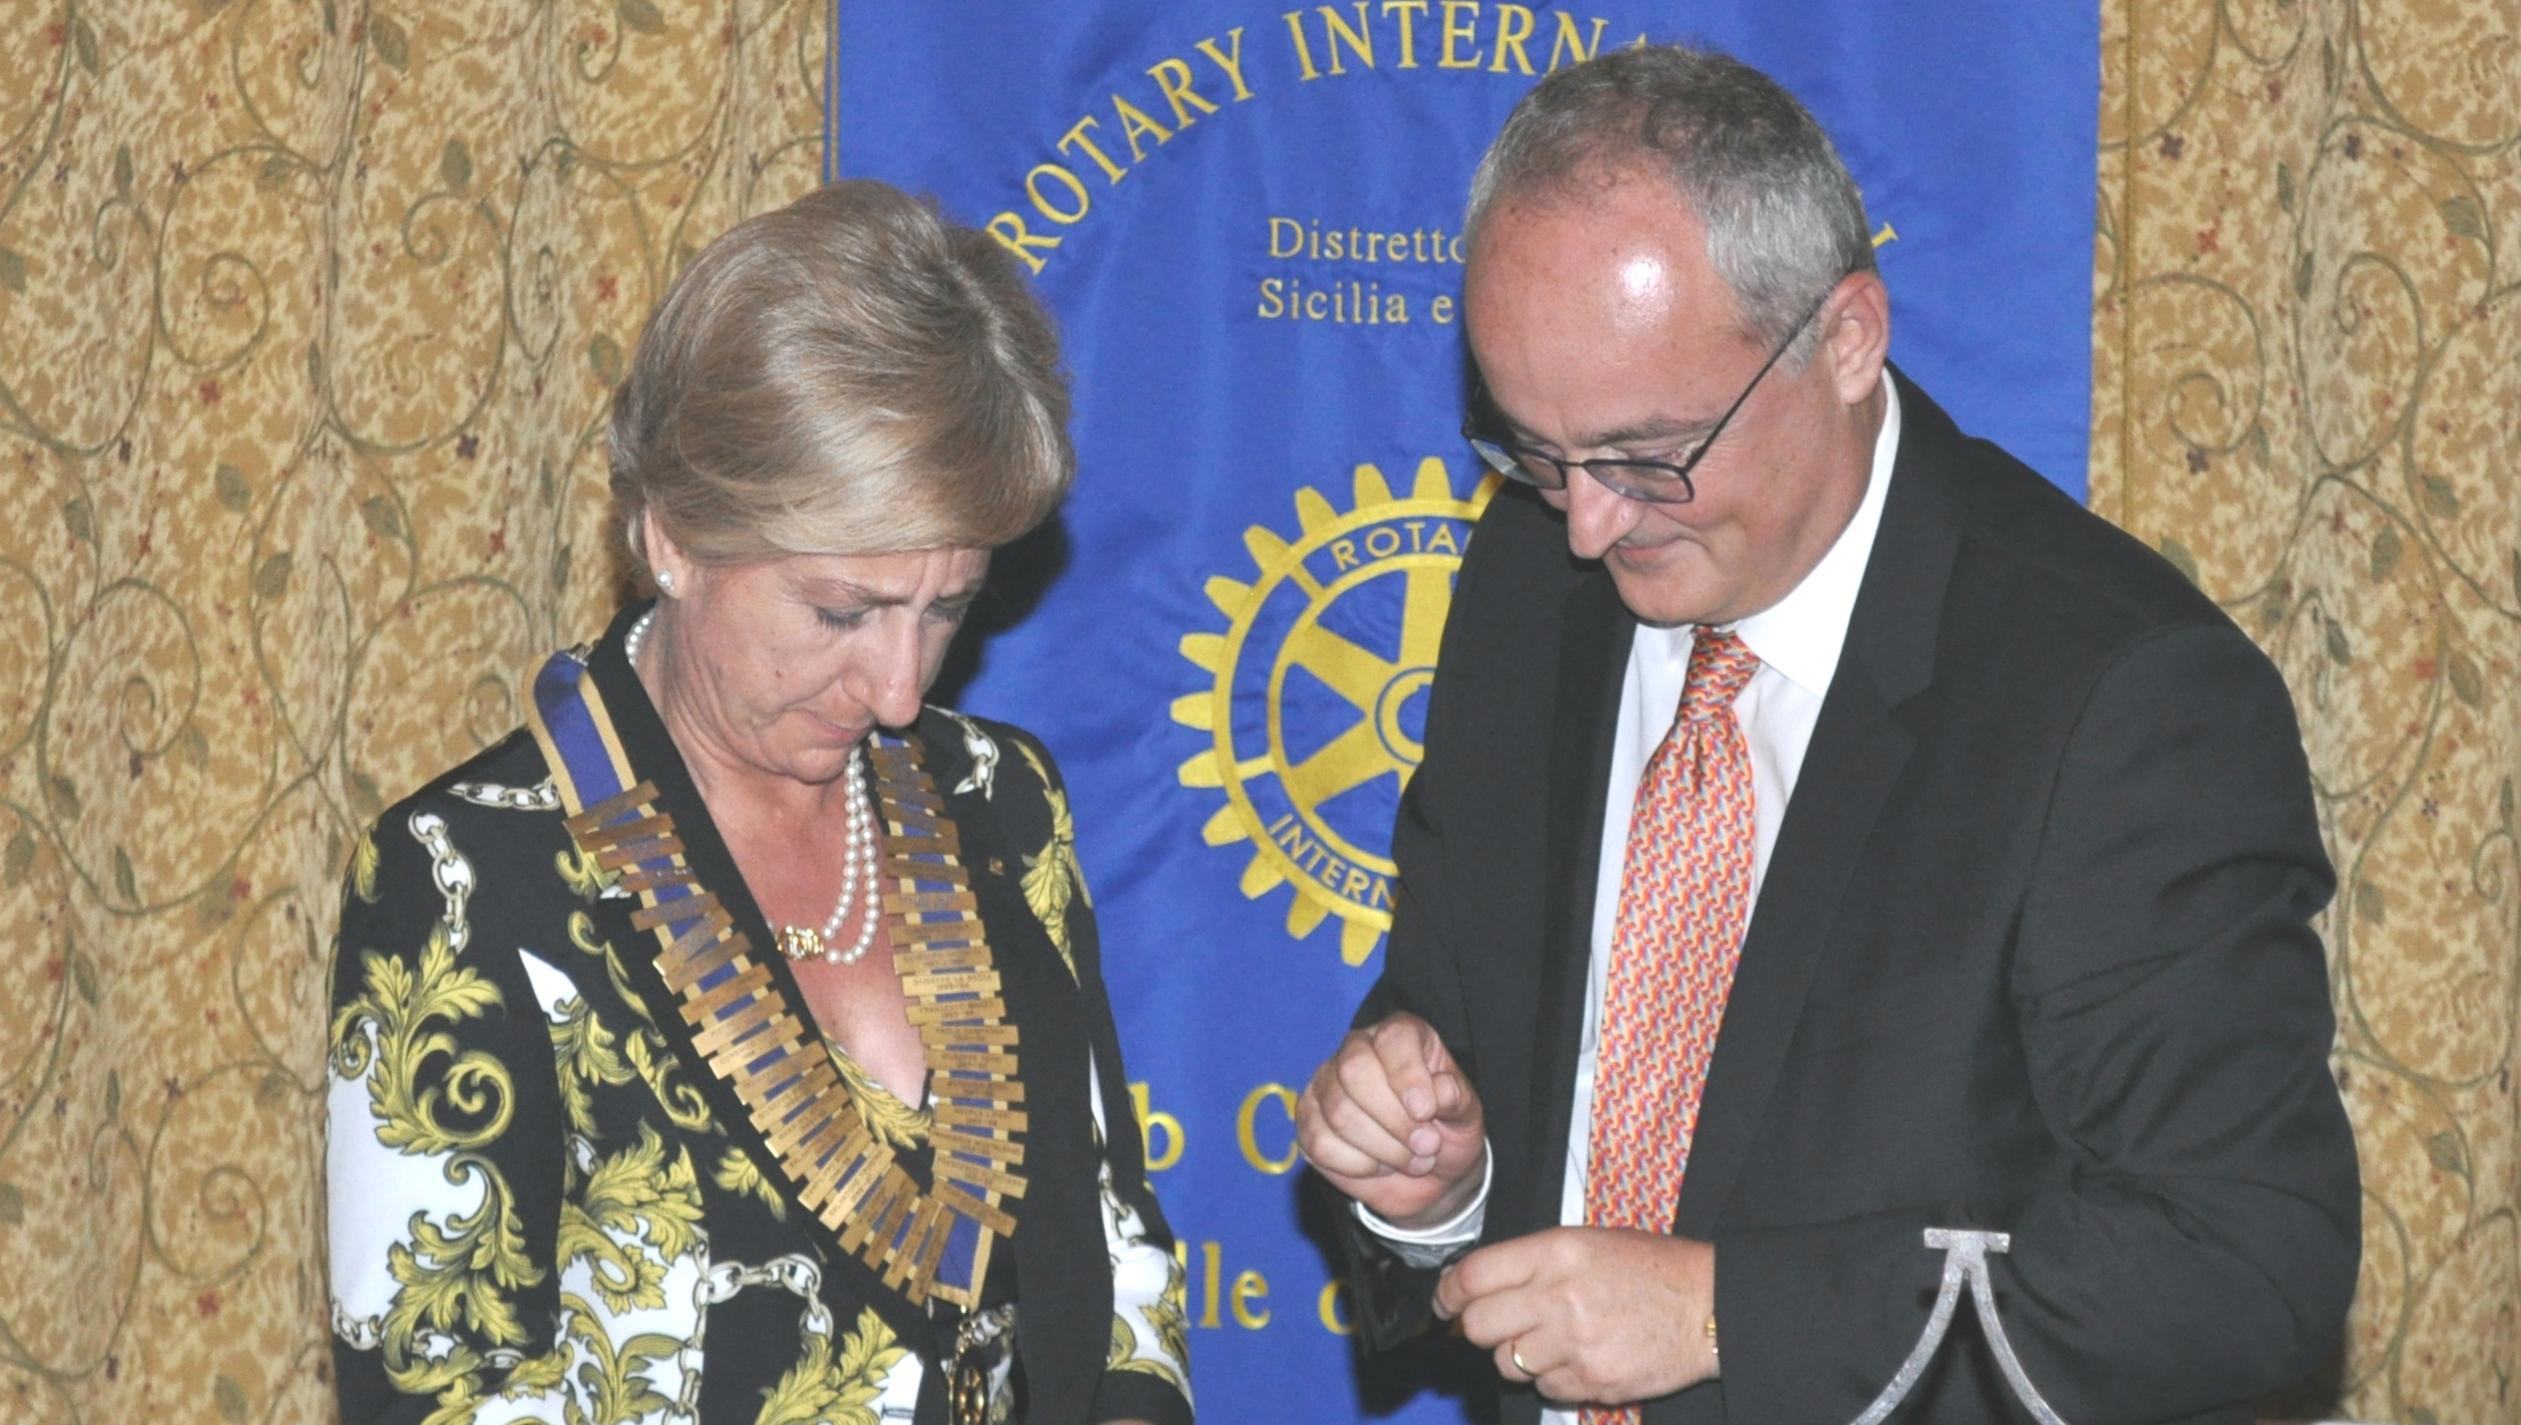 MariaRosa Barone nuovo presidente Rotary Castelvetrano